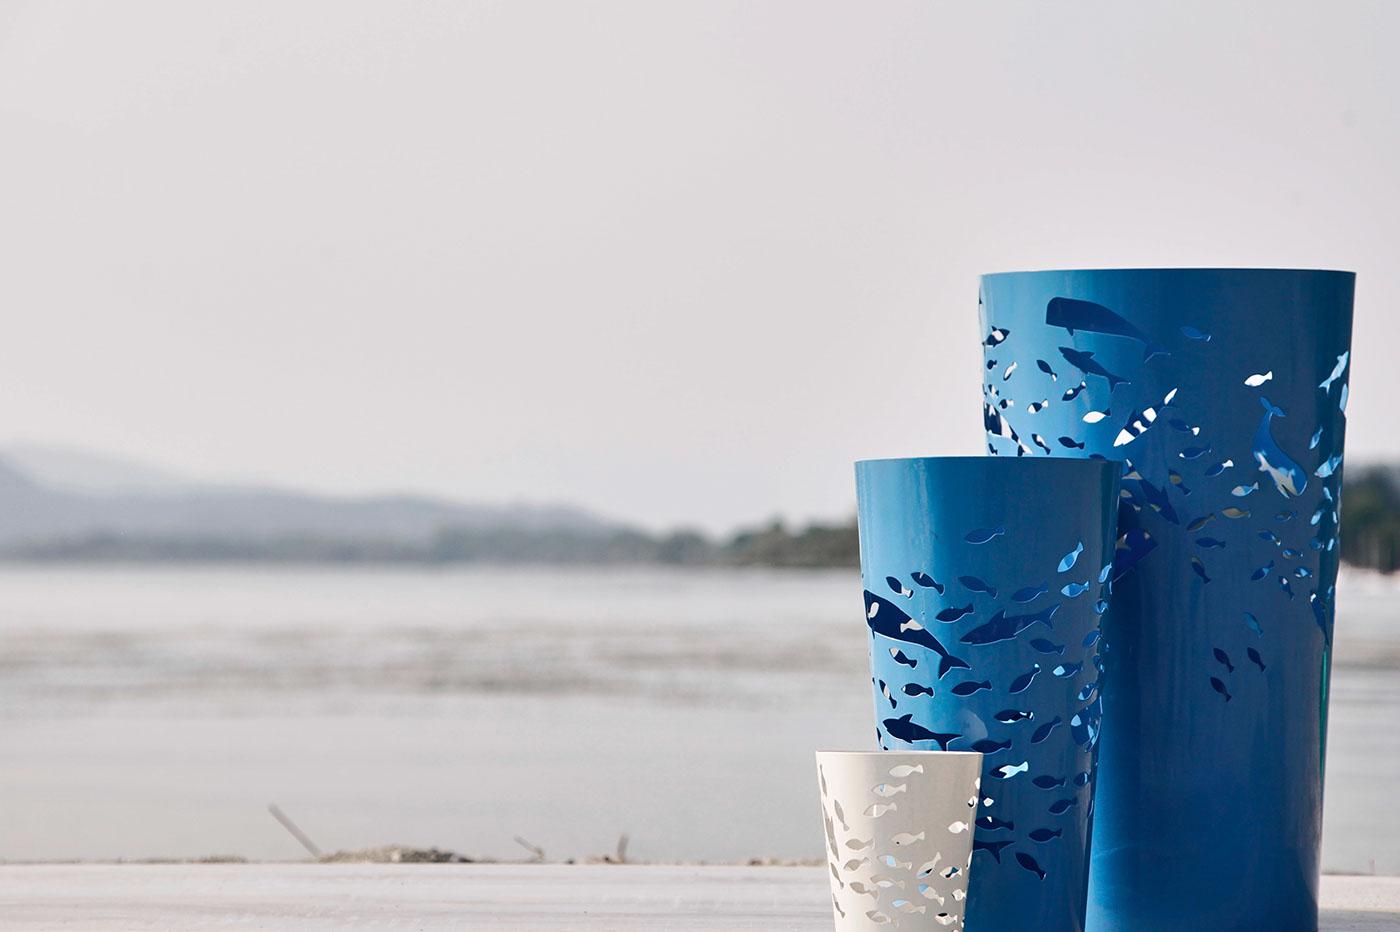 Adobe Portfolio Lacomet Design laser cut Custom Service Lacomet garden living Outdoor vaso vassels